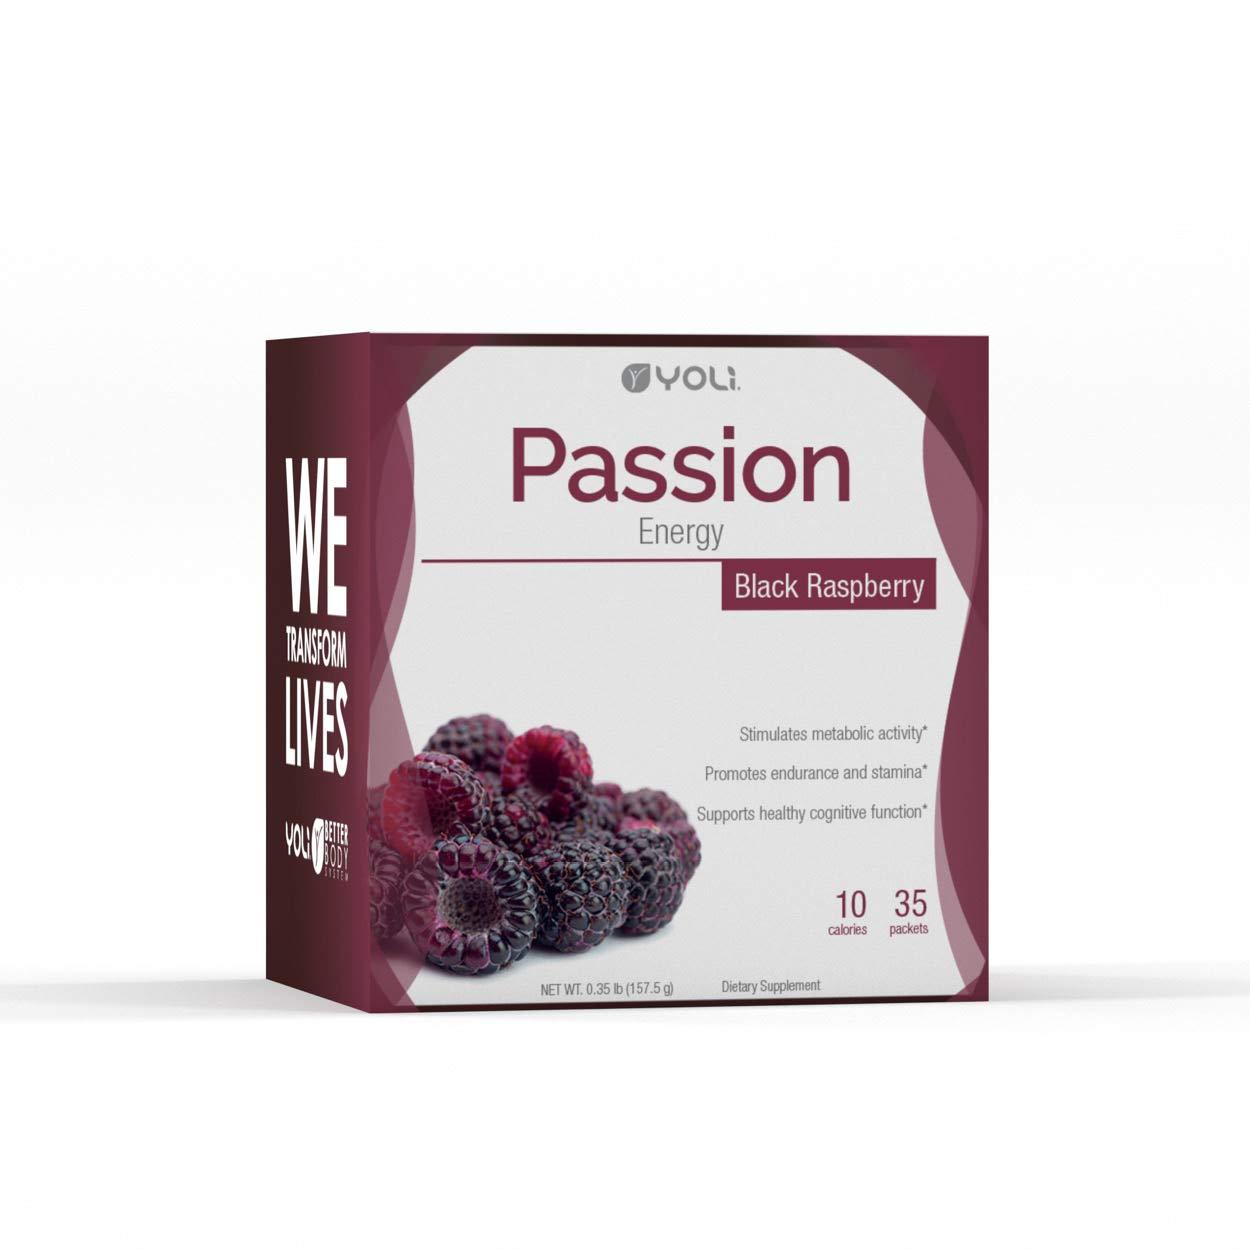 Yoli Passion Black Raspberry Packets Box